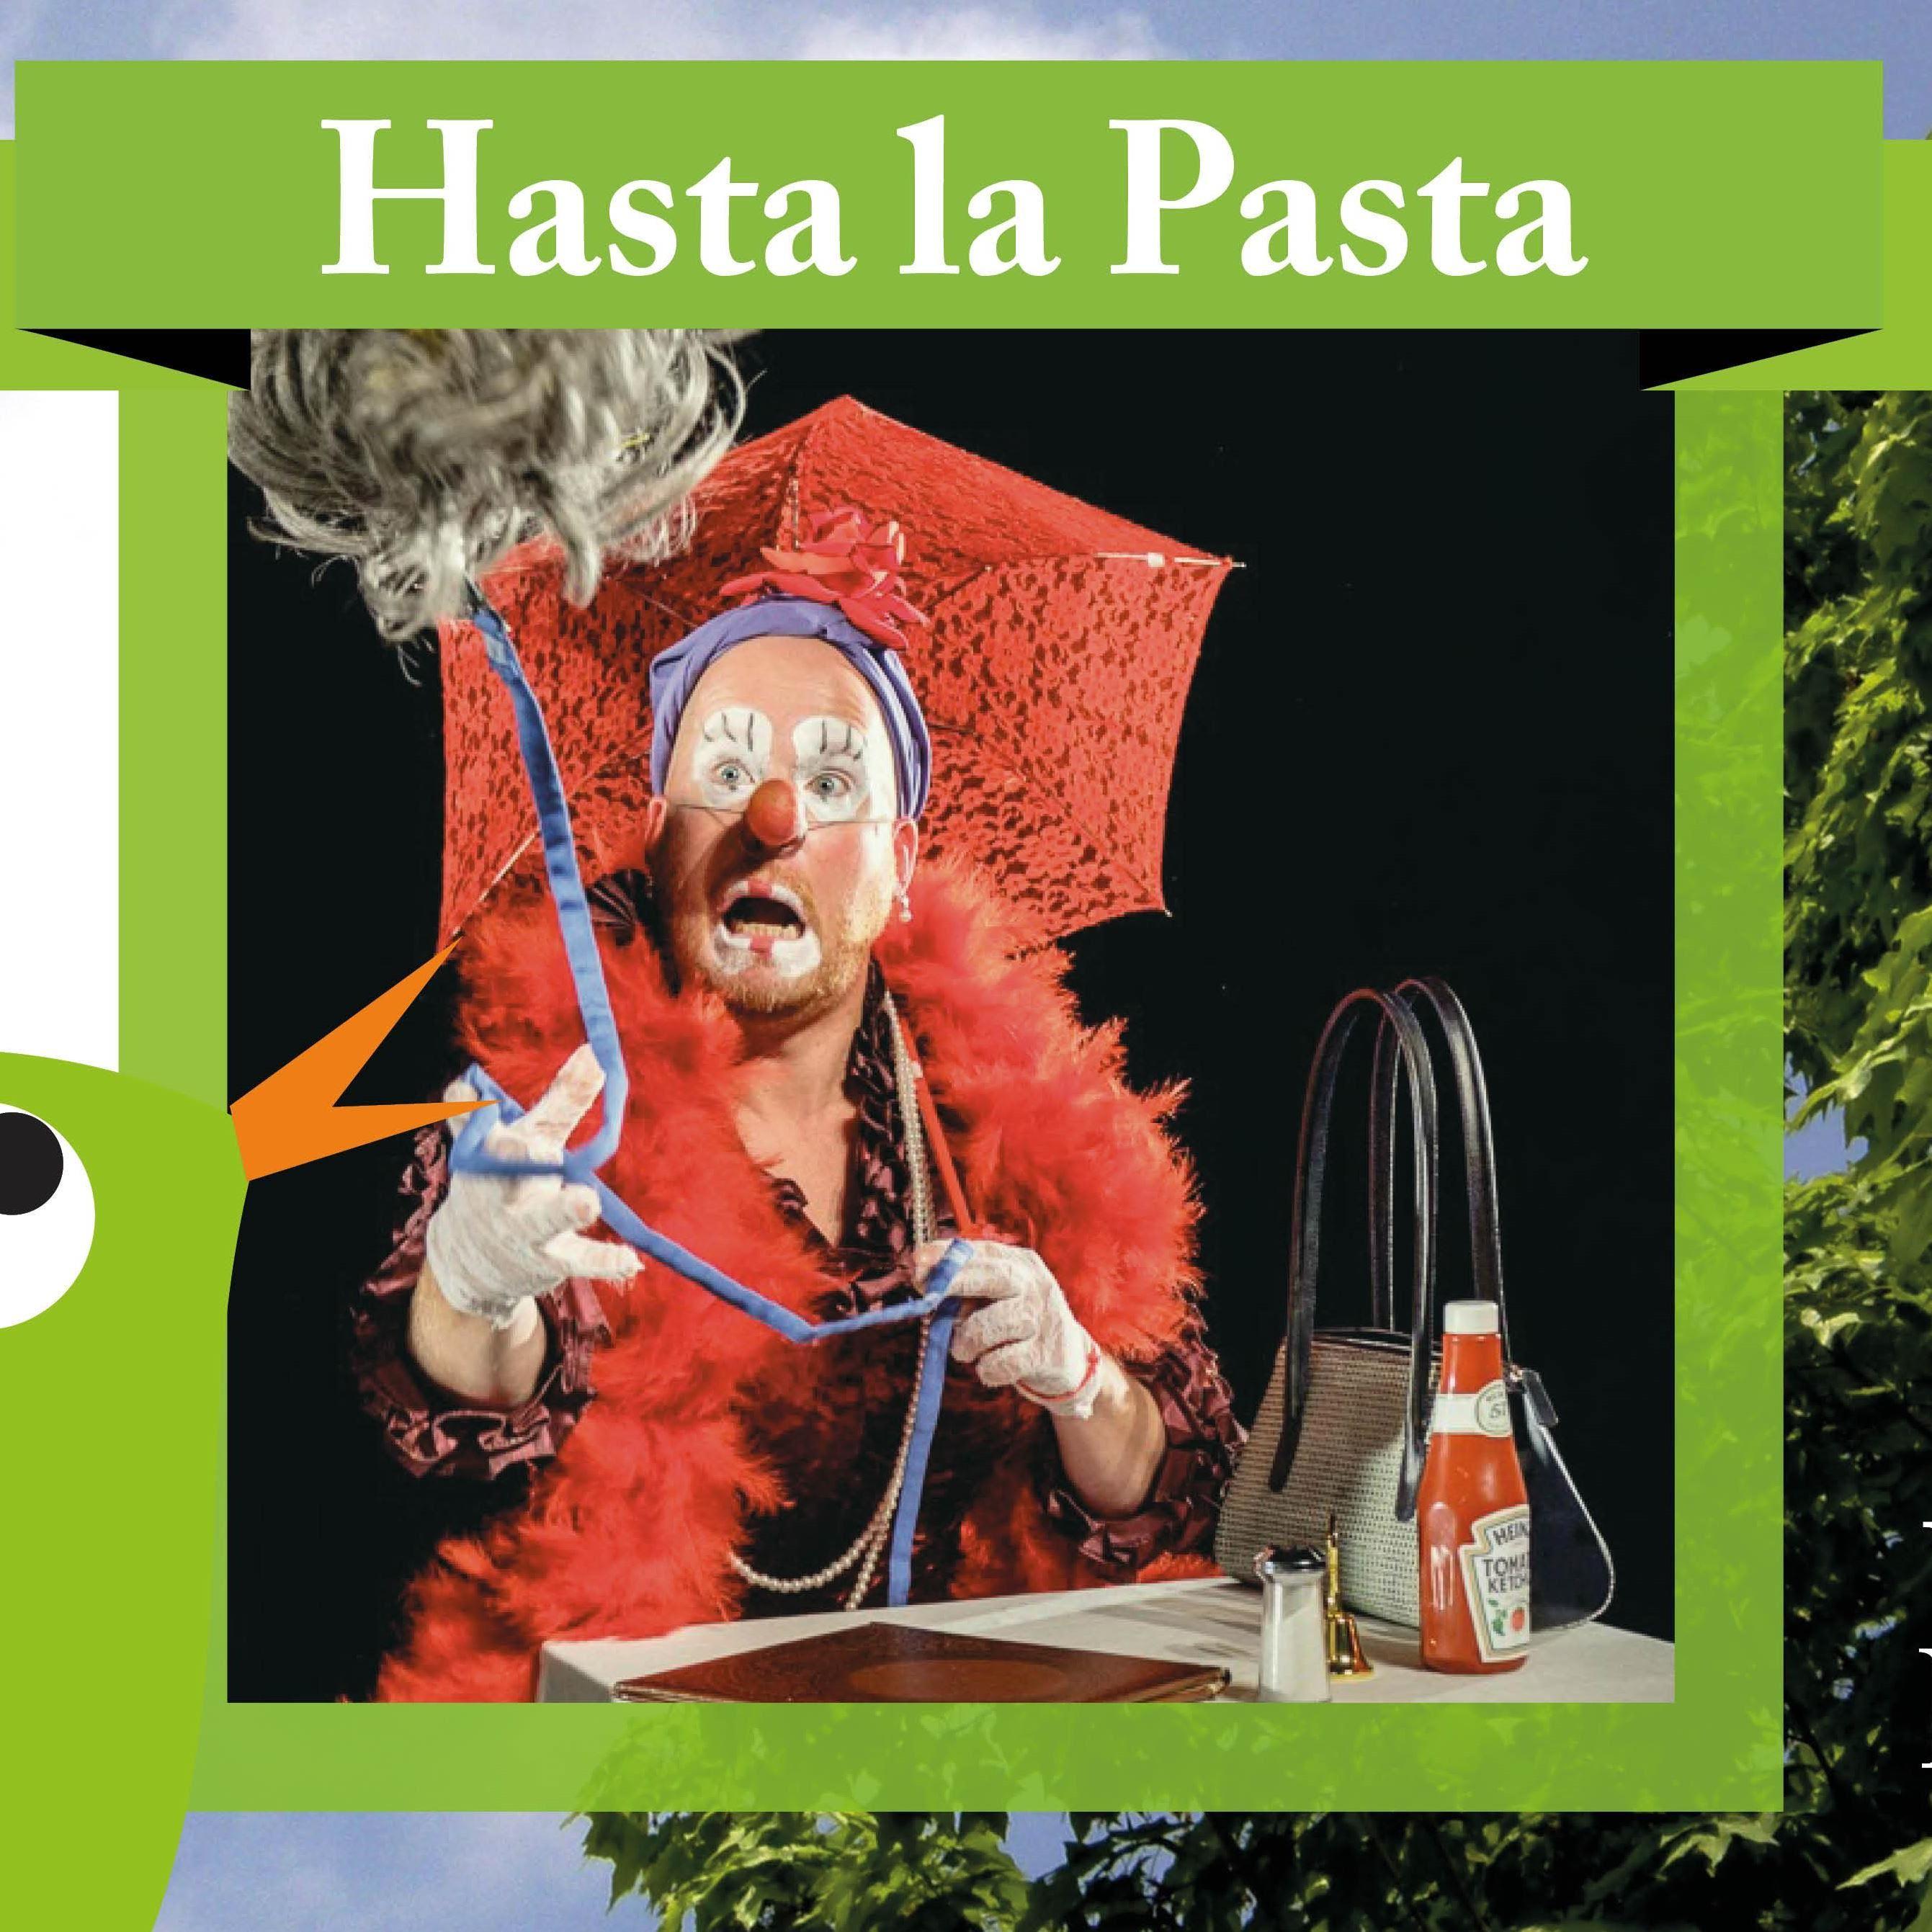 Scensommar: Hasta la pasta